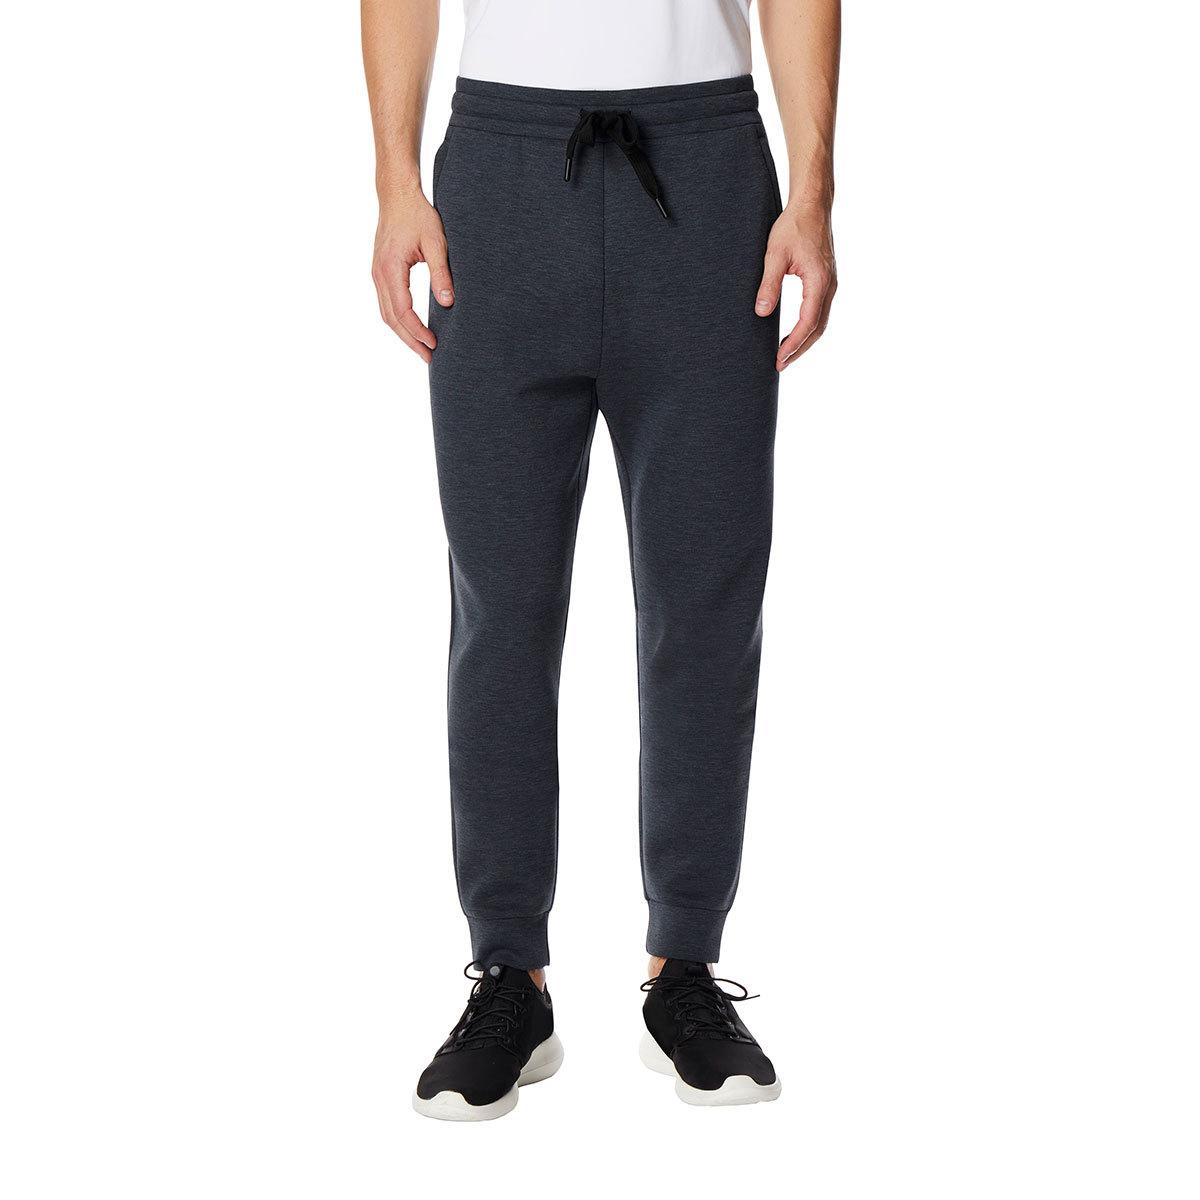 32 Degrees Heat Pants Tipo Jogger Para Caballero Costco Mexico